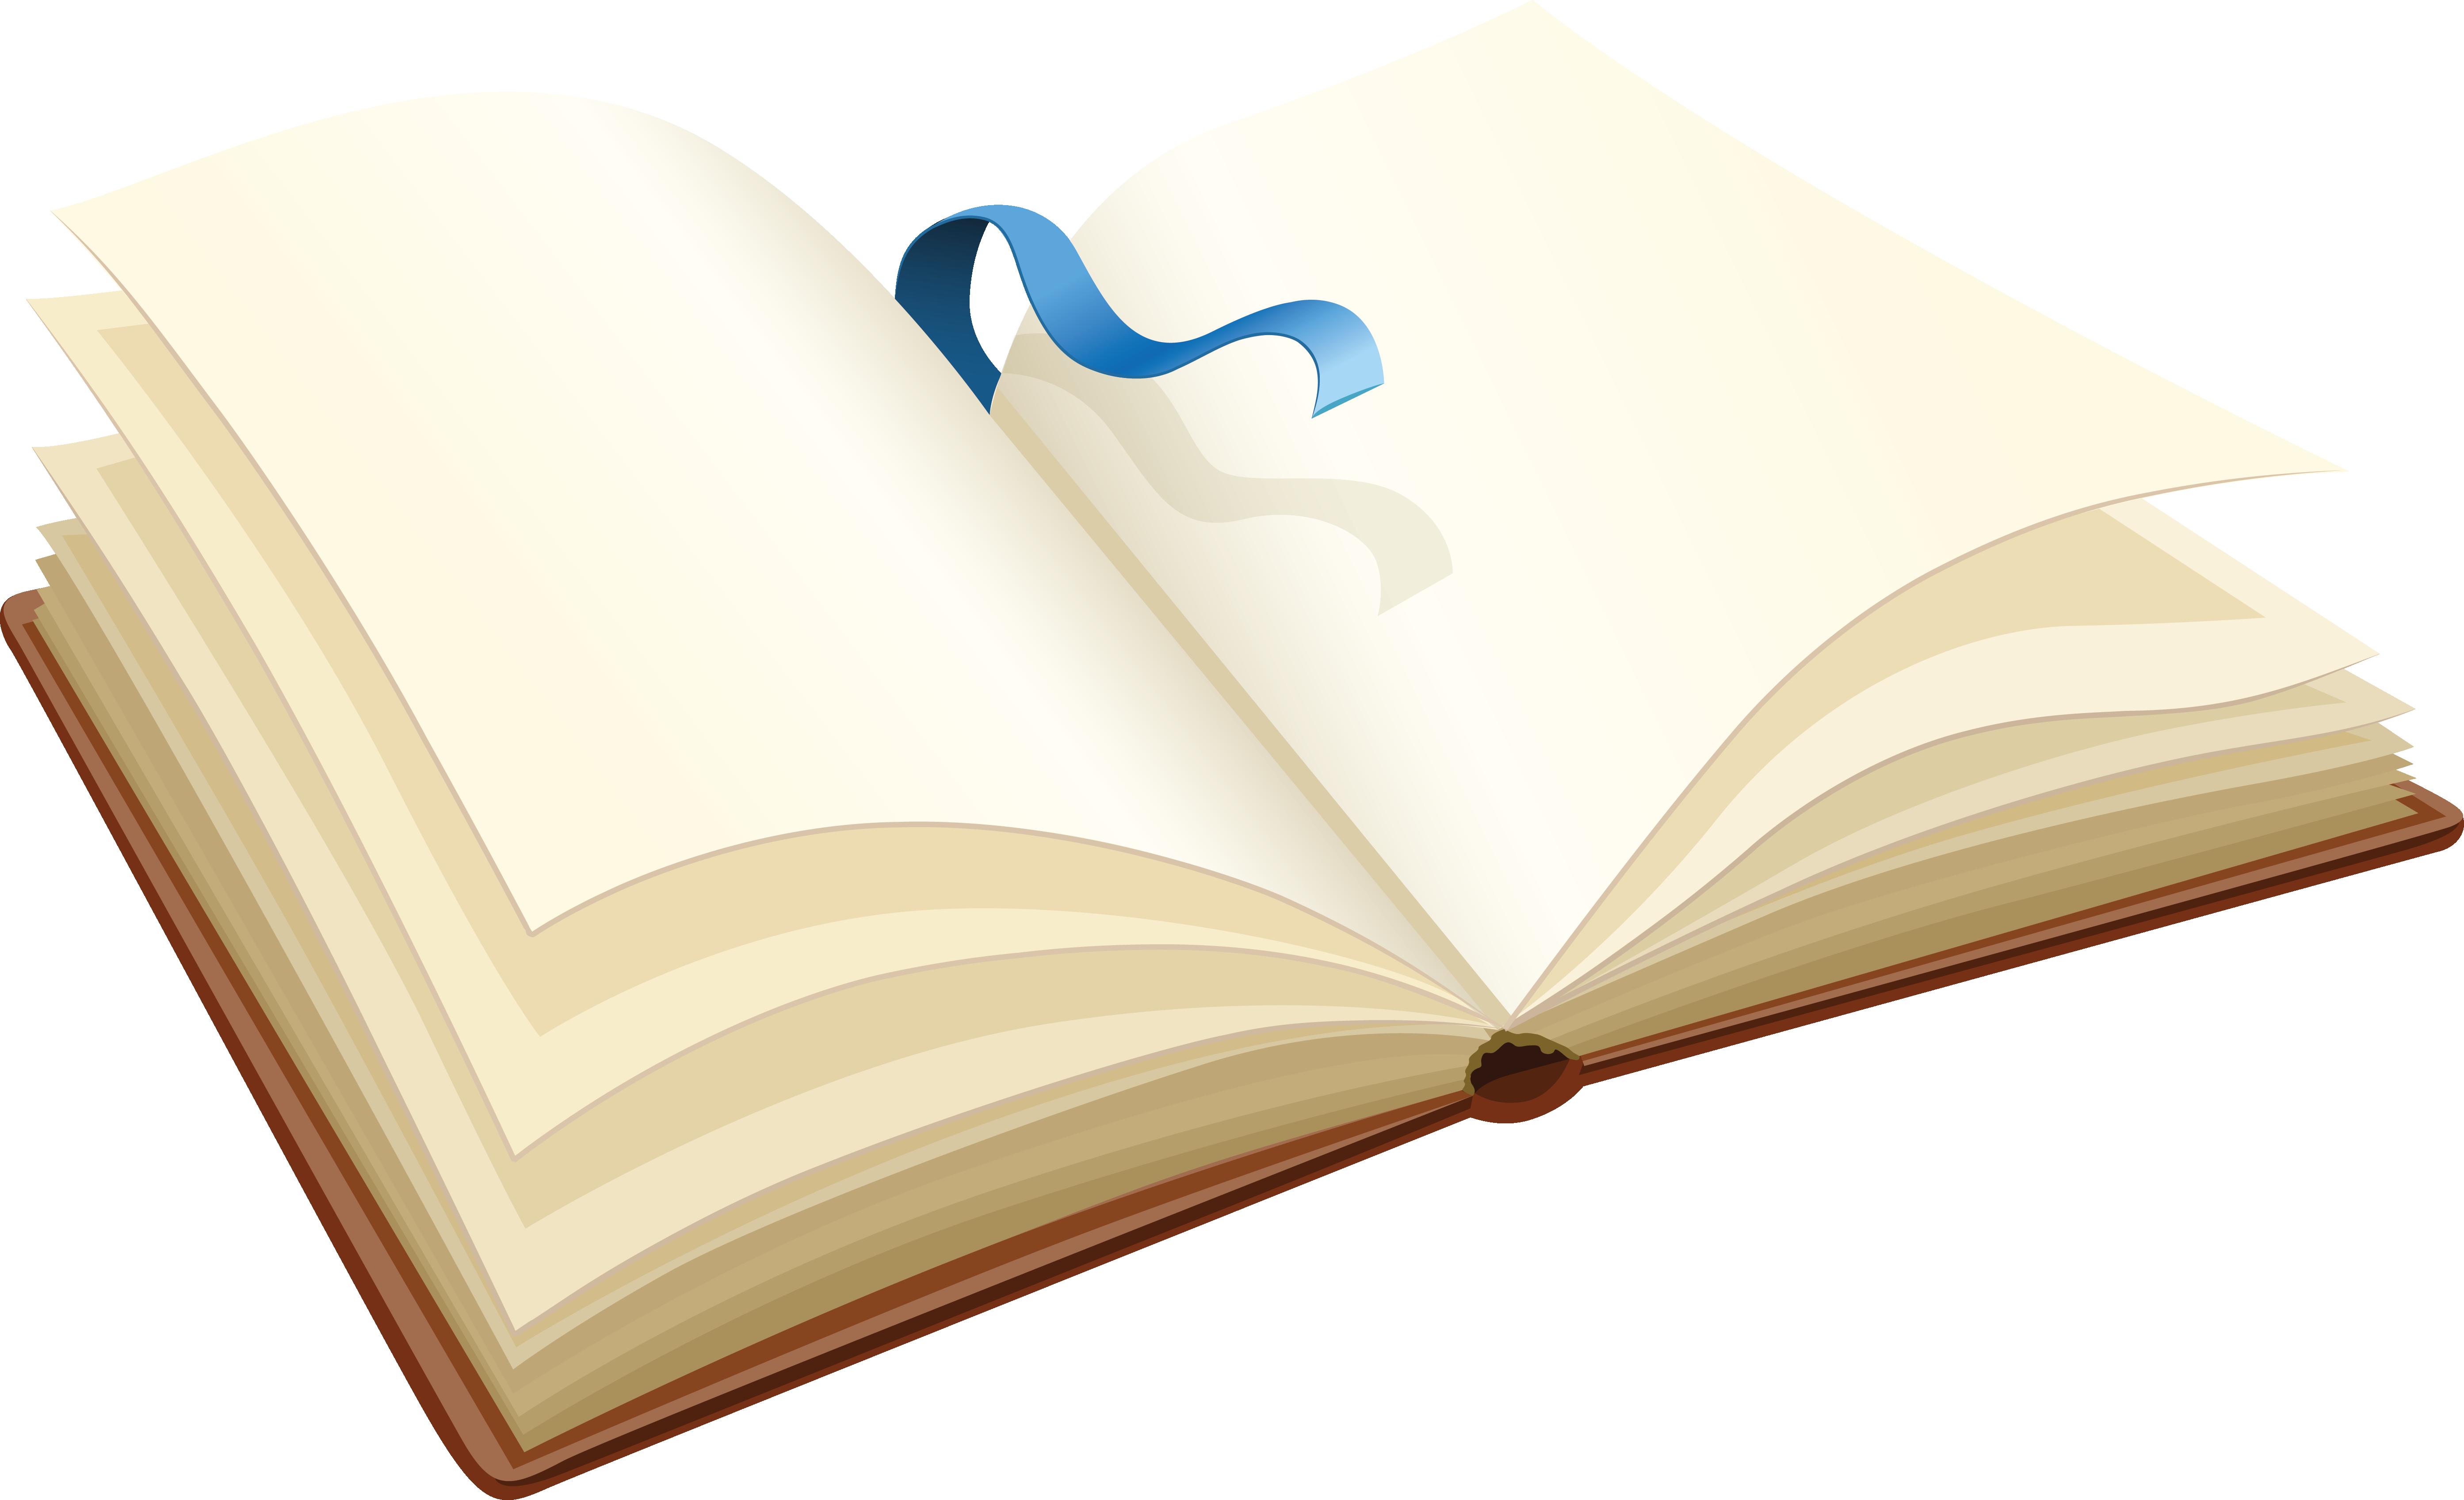 книги раскрытые картинки